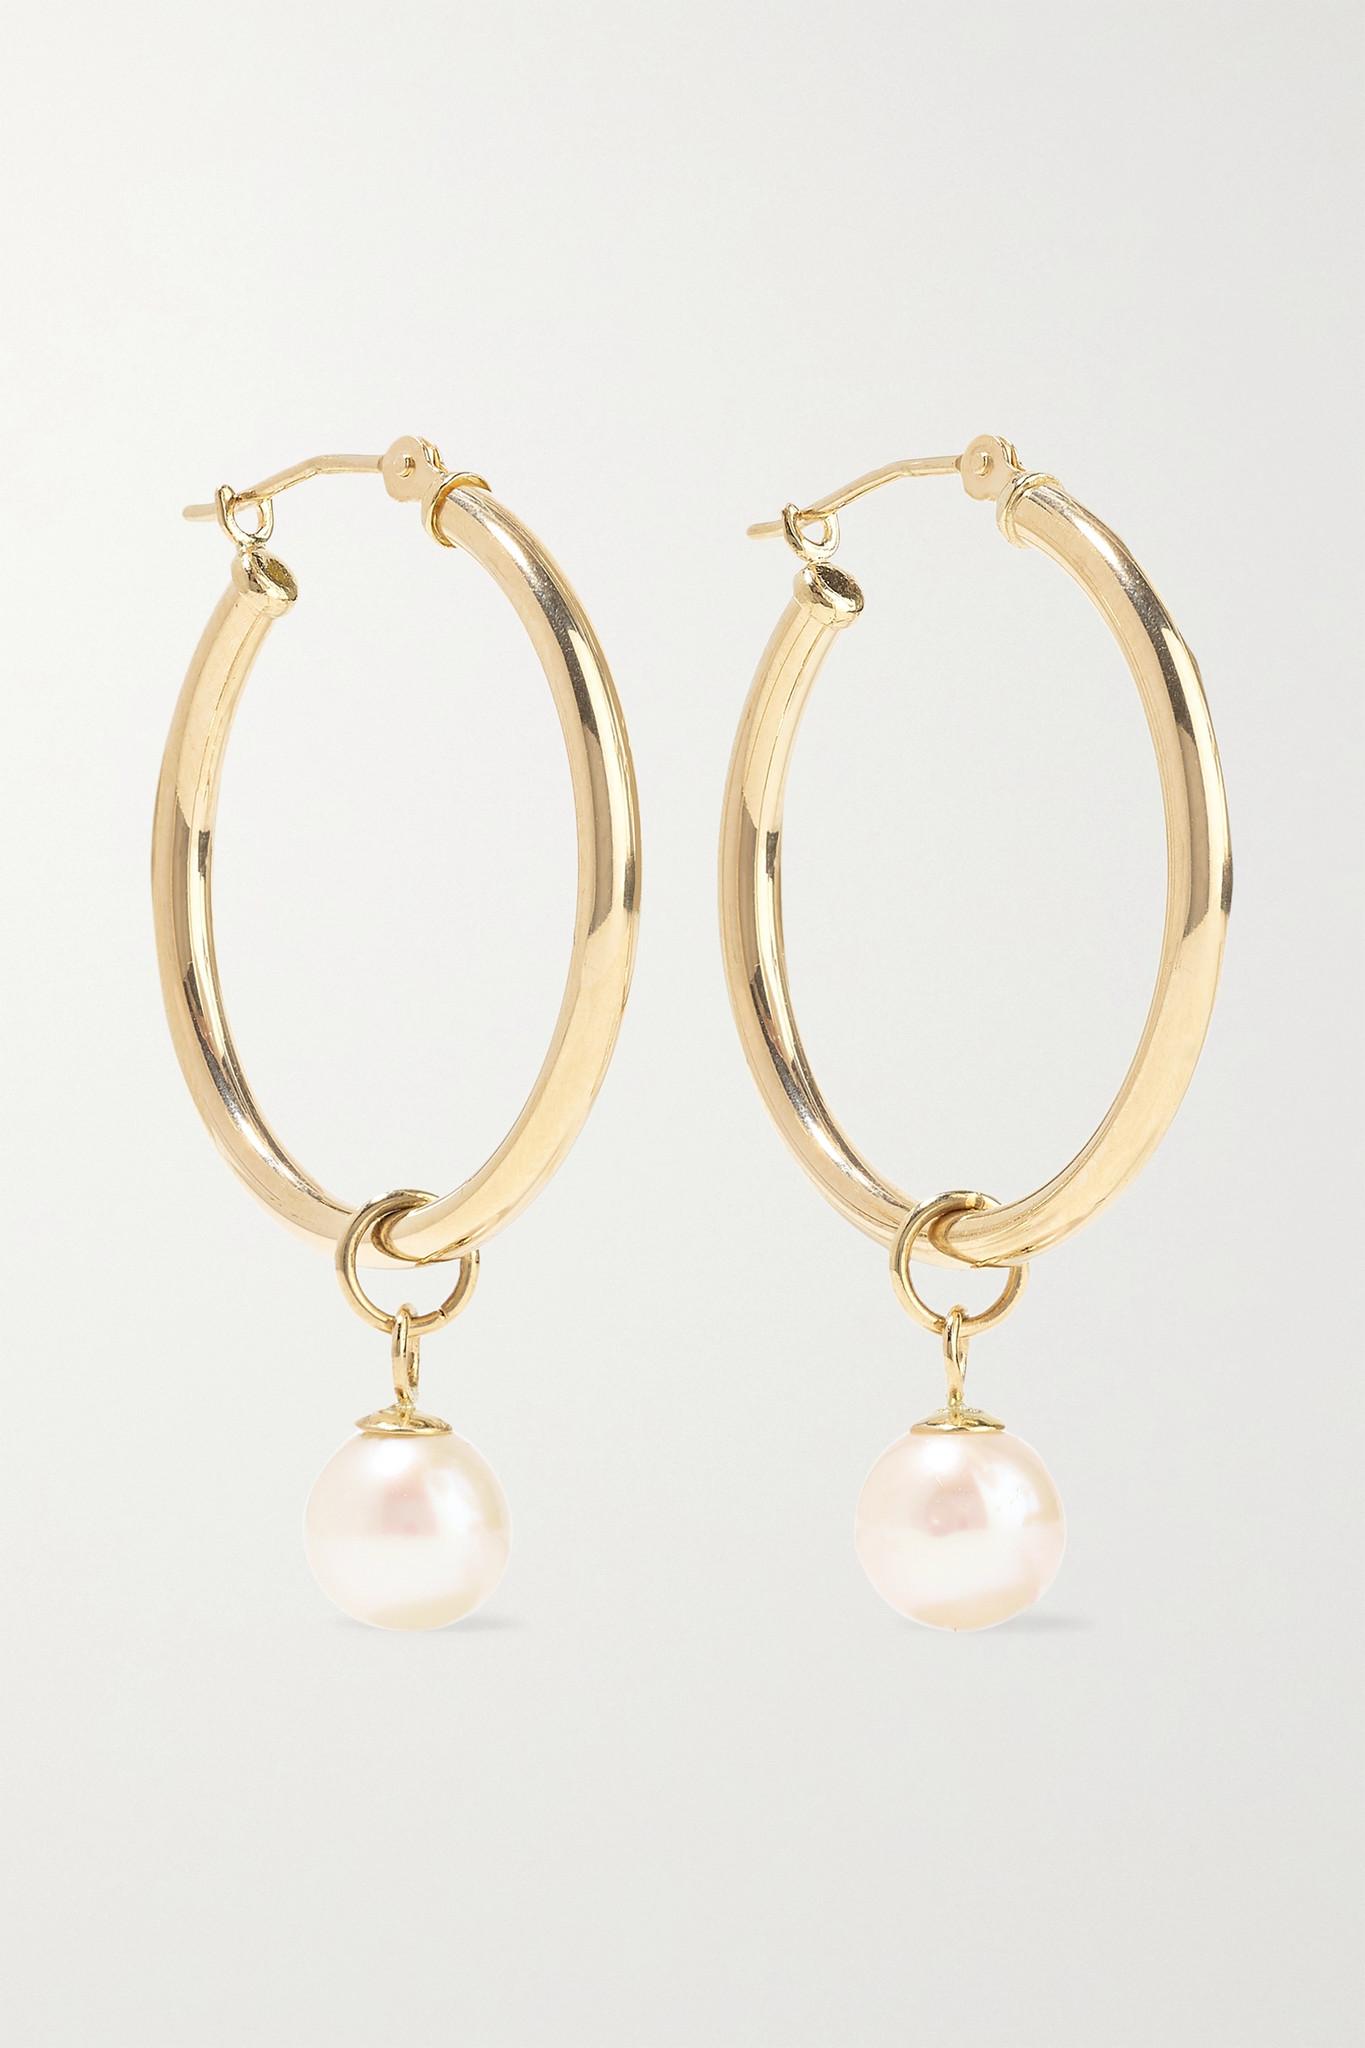 MATEO - 14-karat Gold Pearl Hoop Earrings - one size